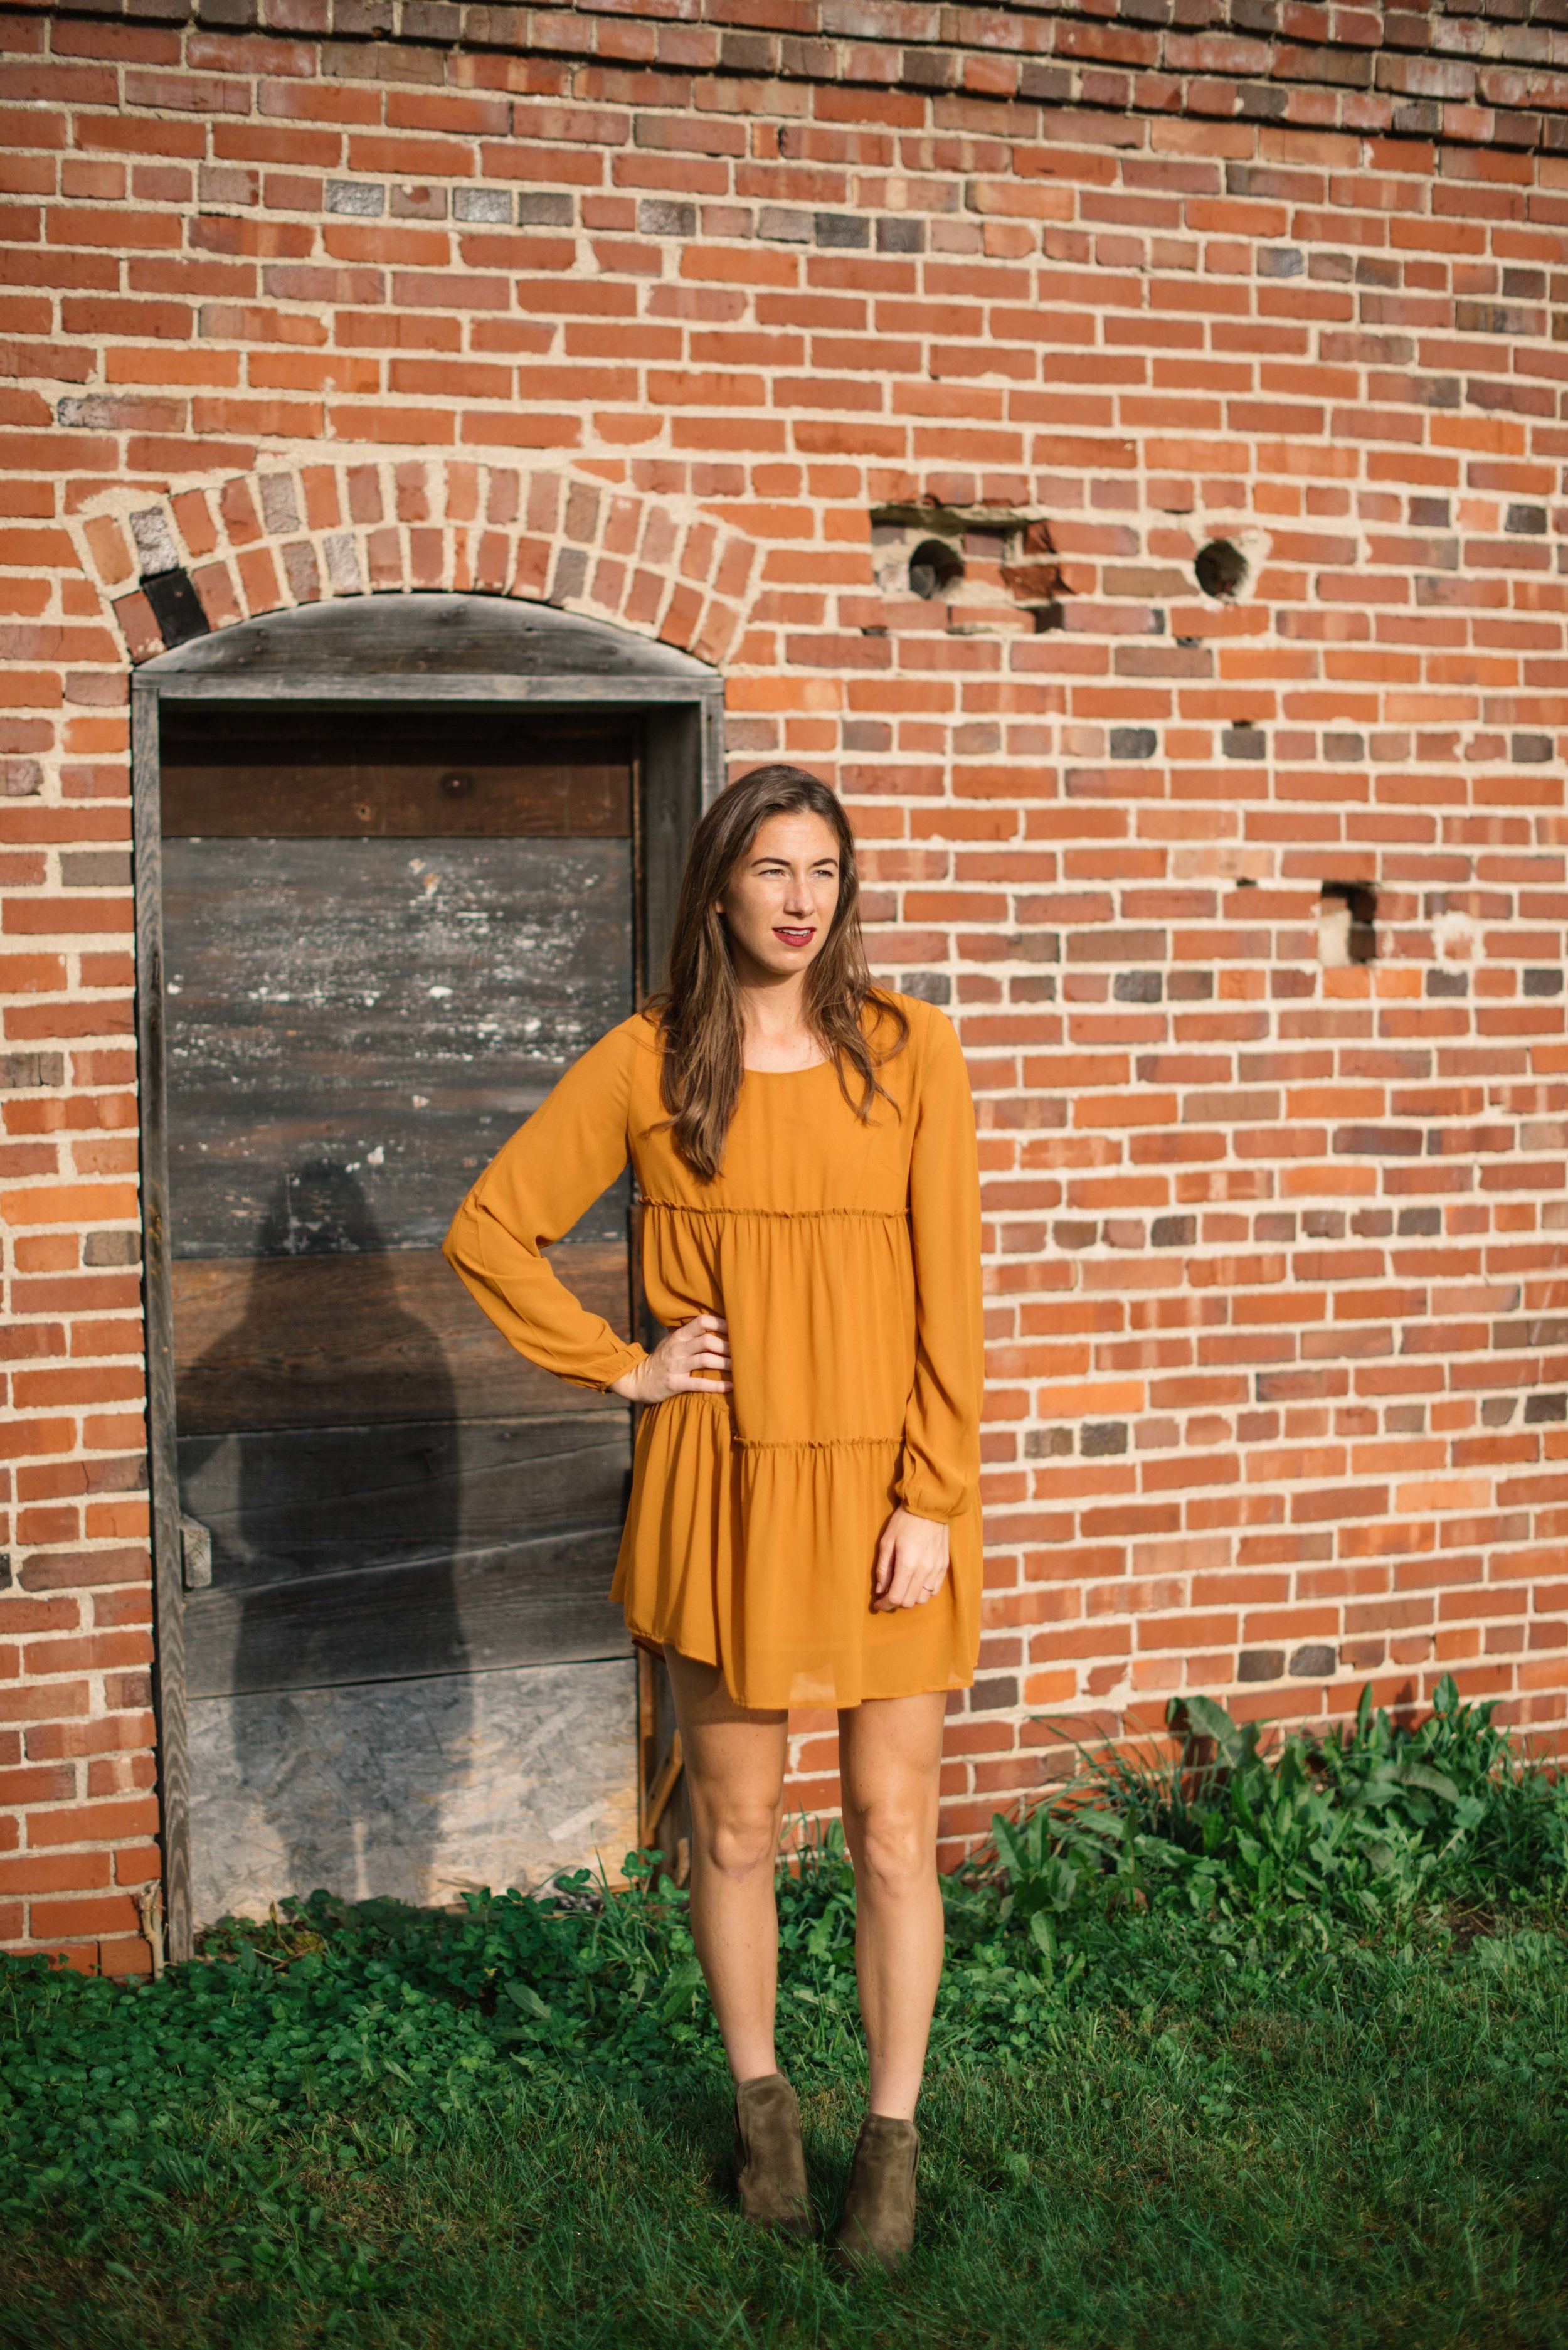 StephanieFallLooks-88.jpg